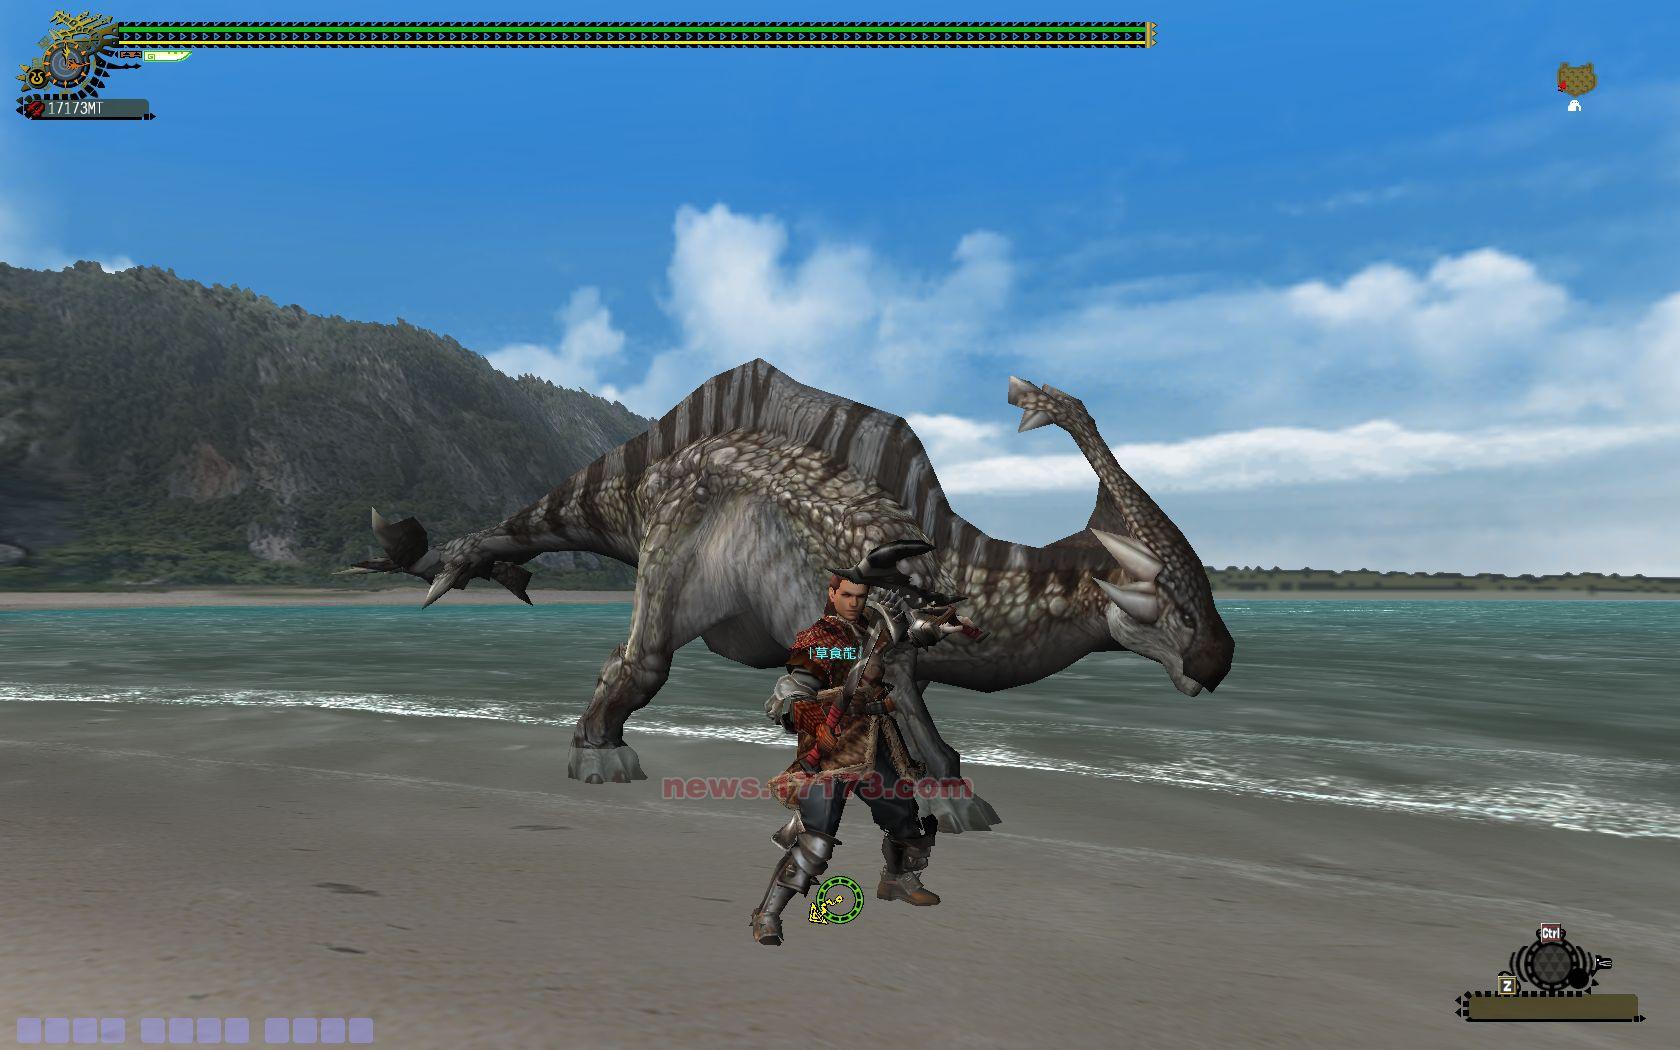 �����olzg>K��{�~x�_十一种武器 怪物猎人ol游戏高清截图展示